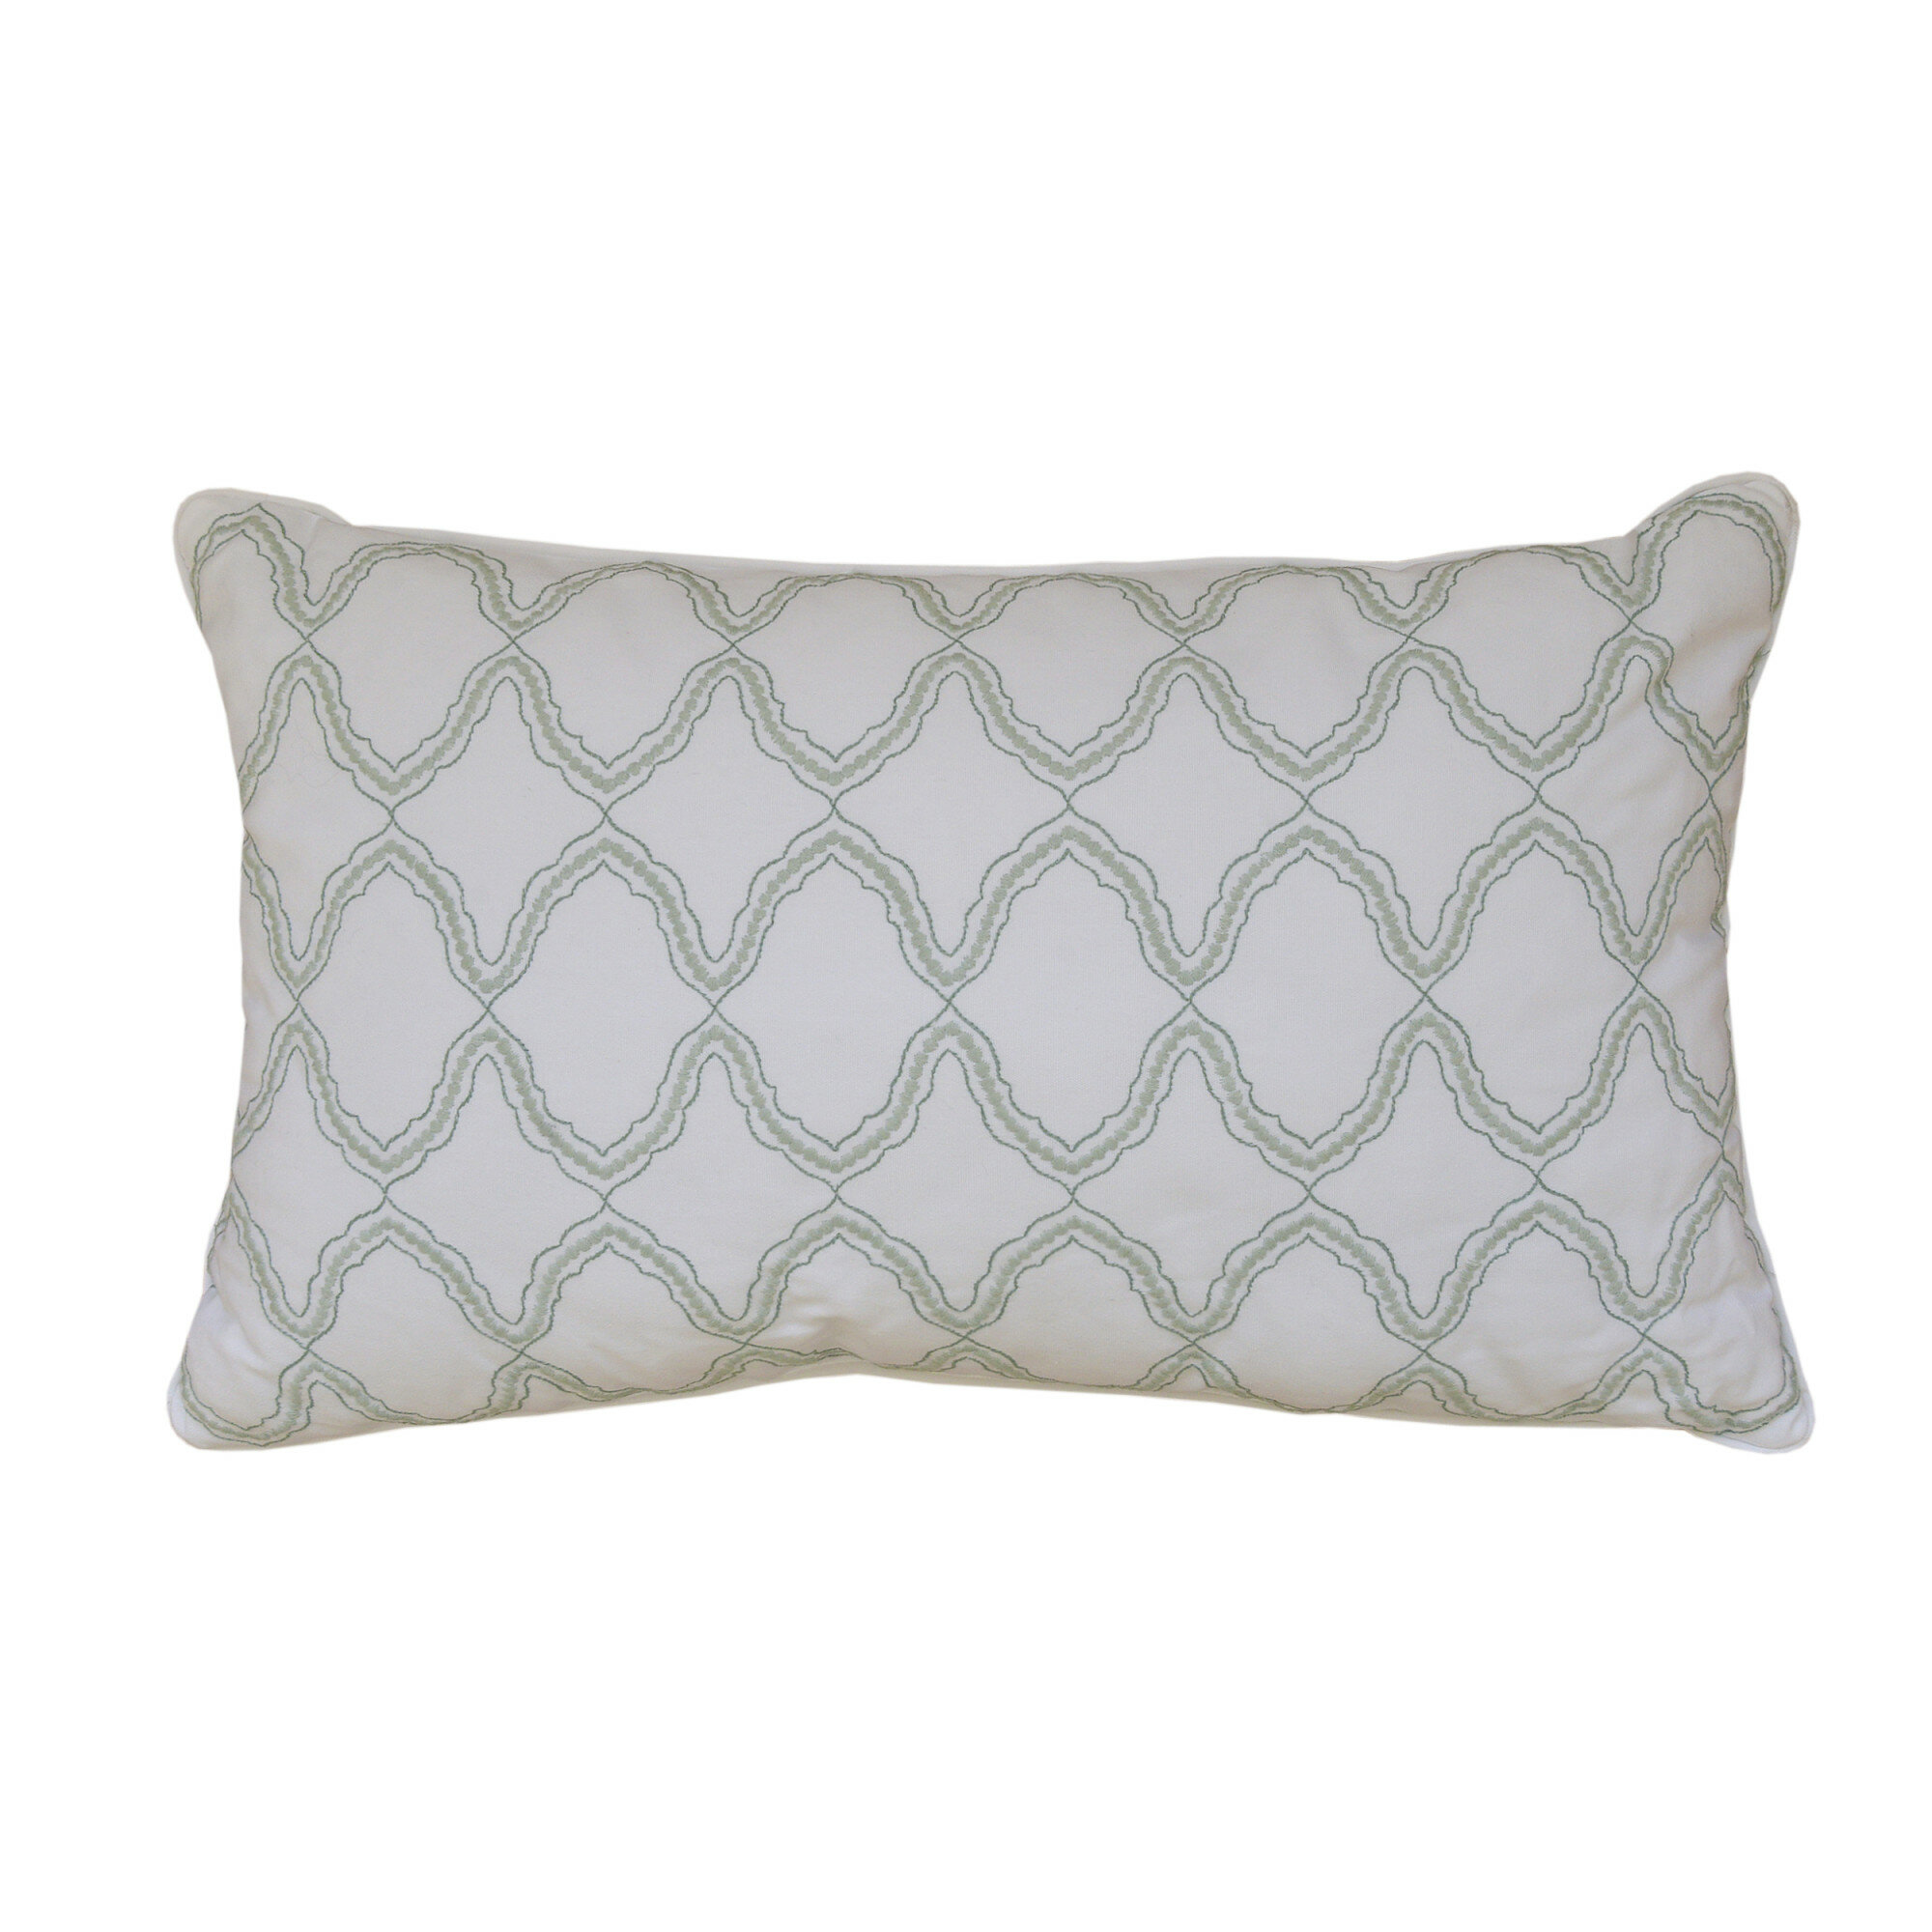 Highland Dunes Synthia Cotton Lumbar Pillow   Reviews  acc71f9b4